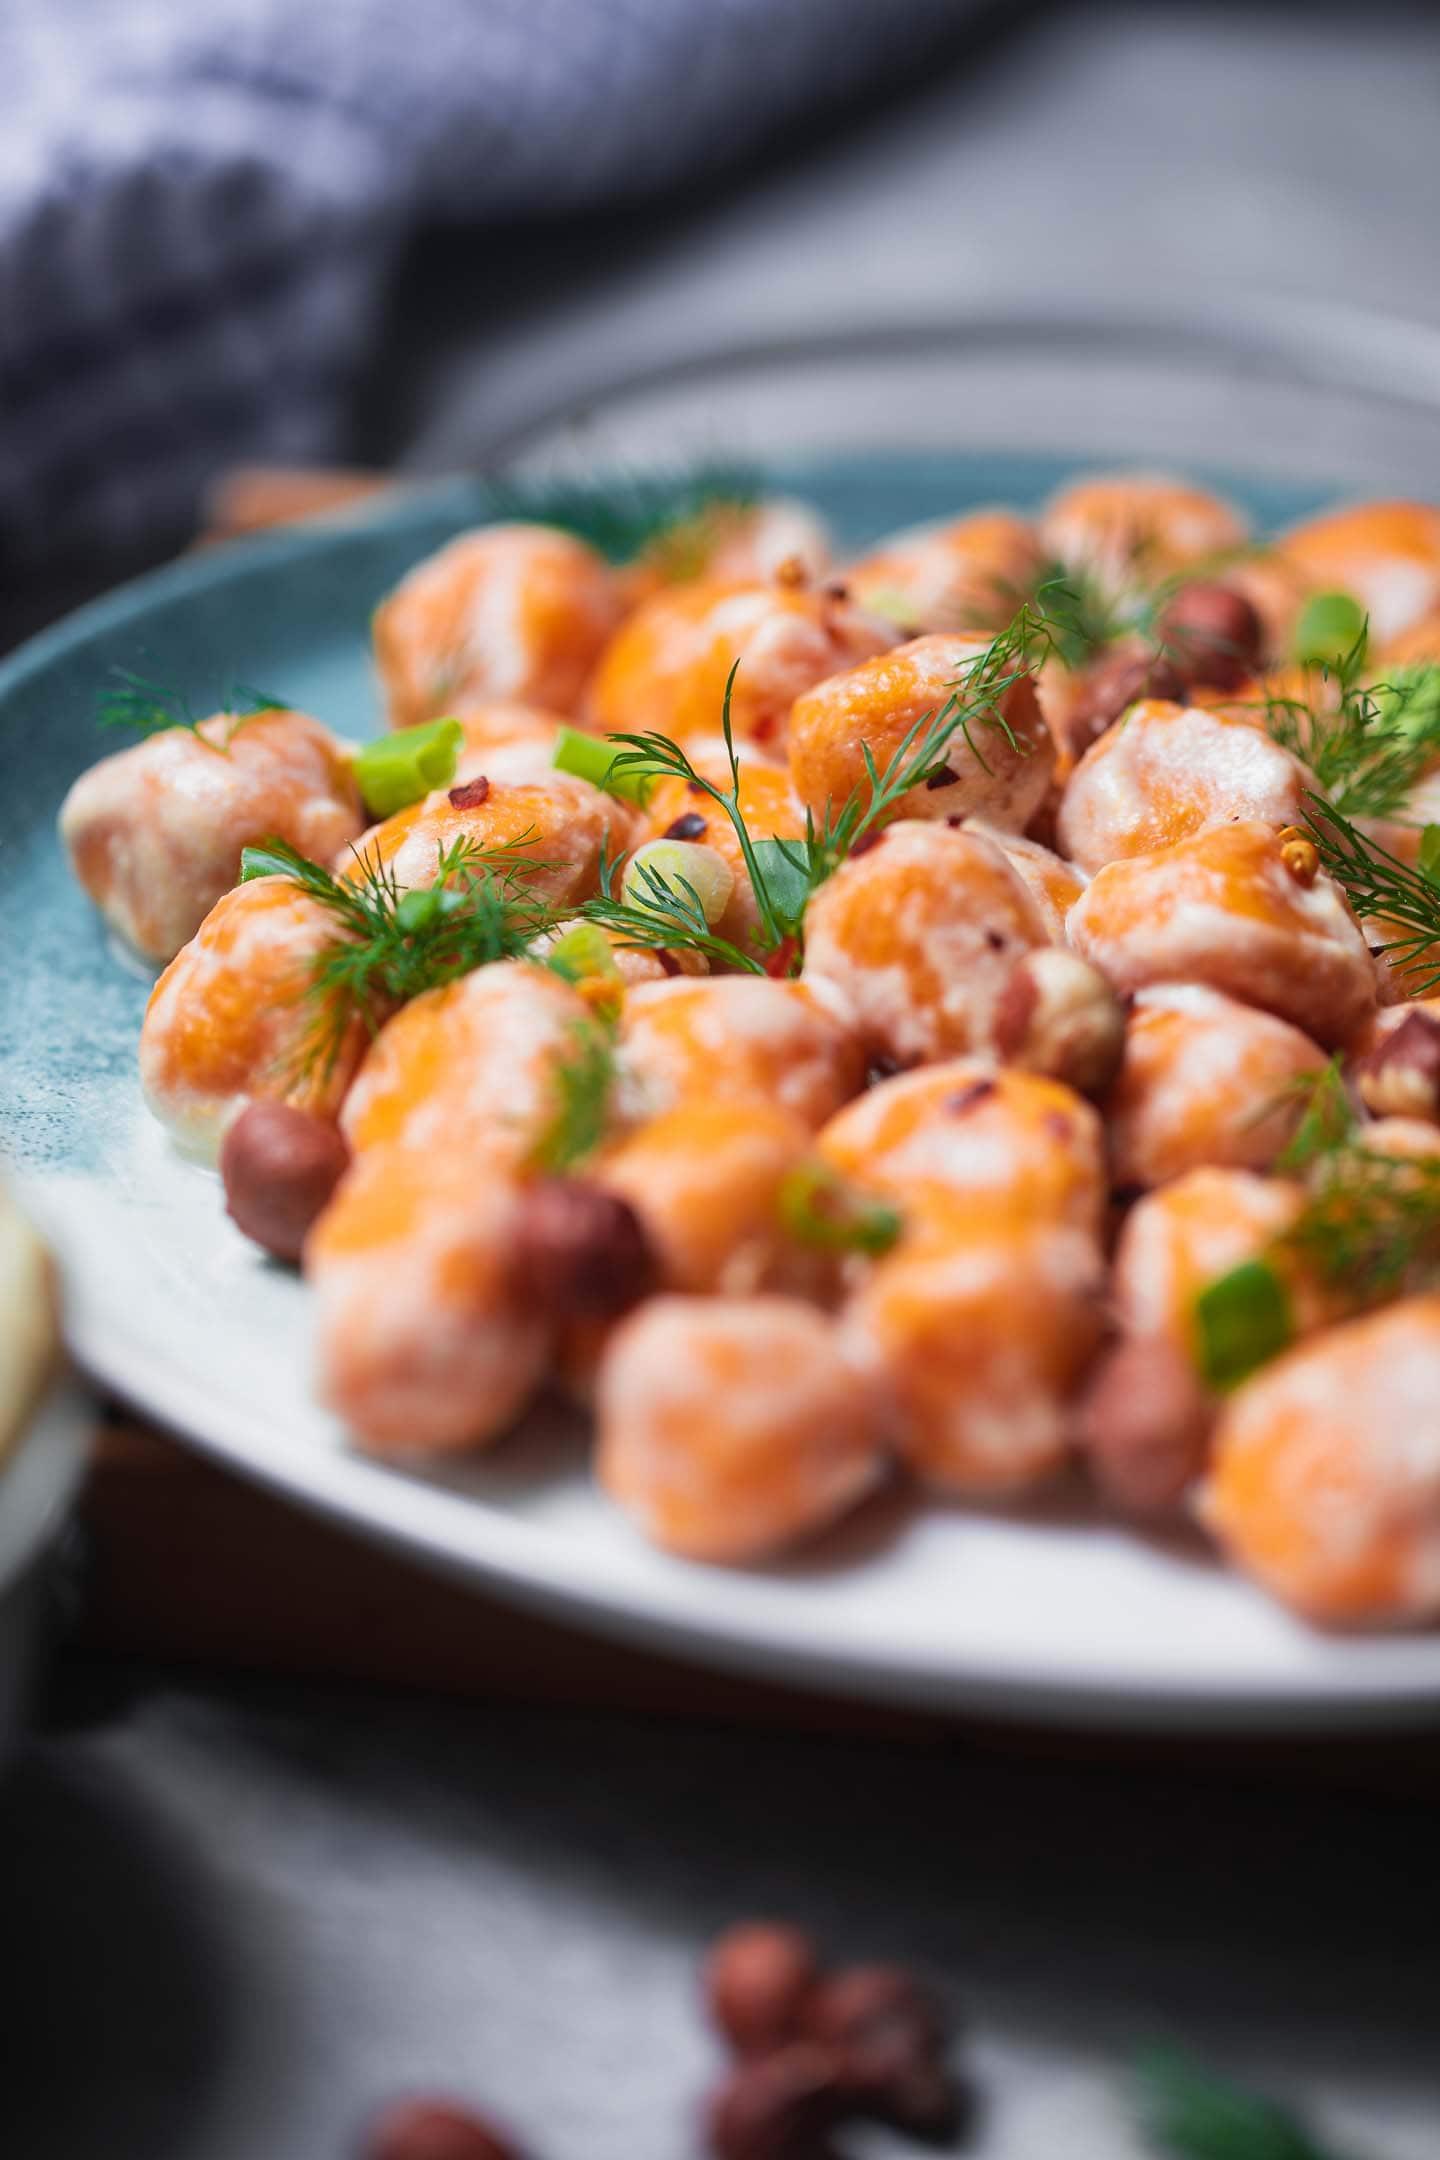 Gluten-free vegan gnocchi with soured cream